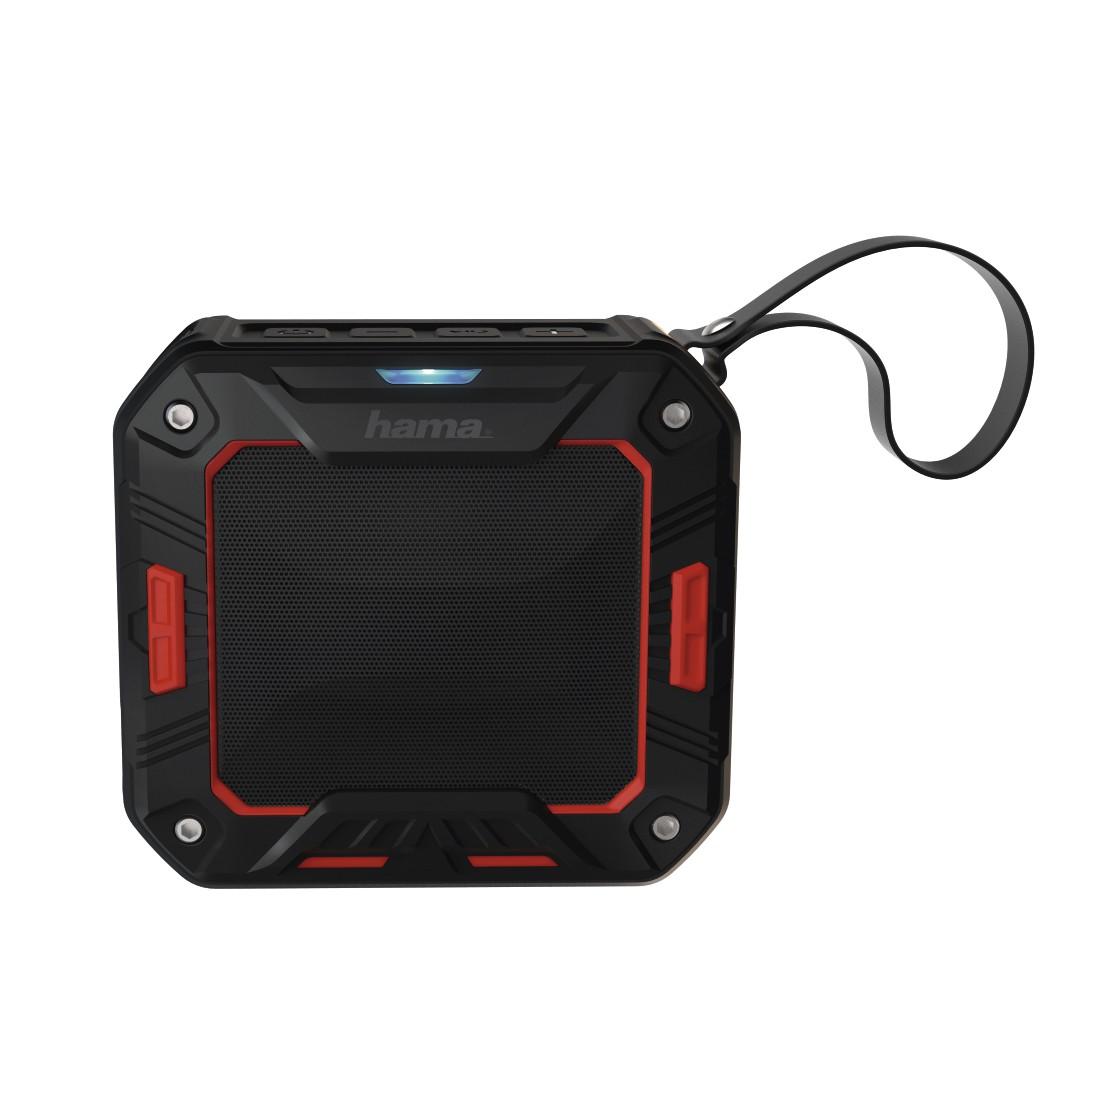 HAMA Rockman-S Mobile Bluetooth Speaker black red